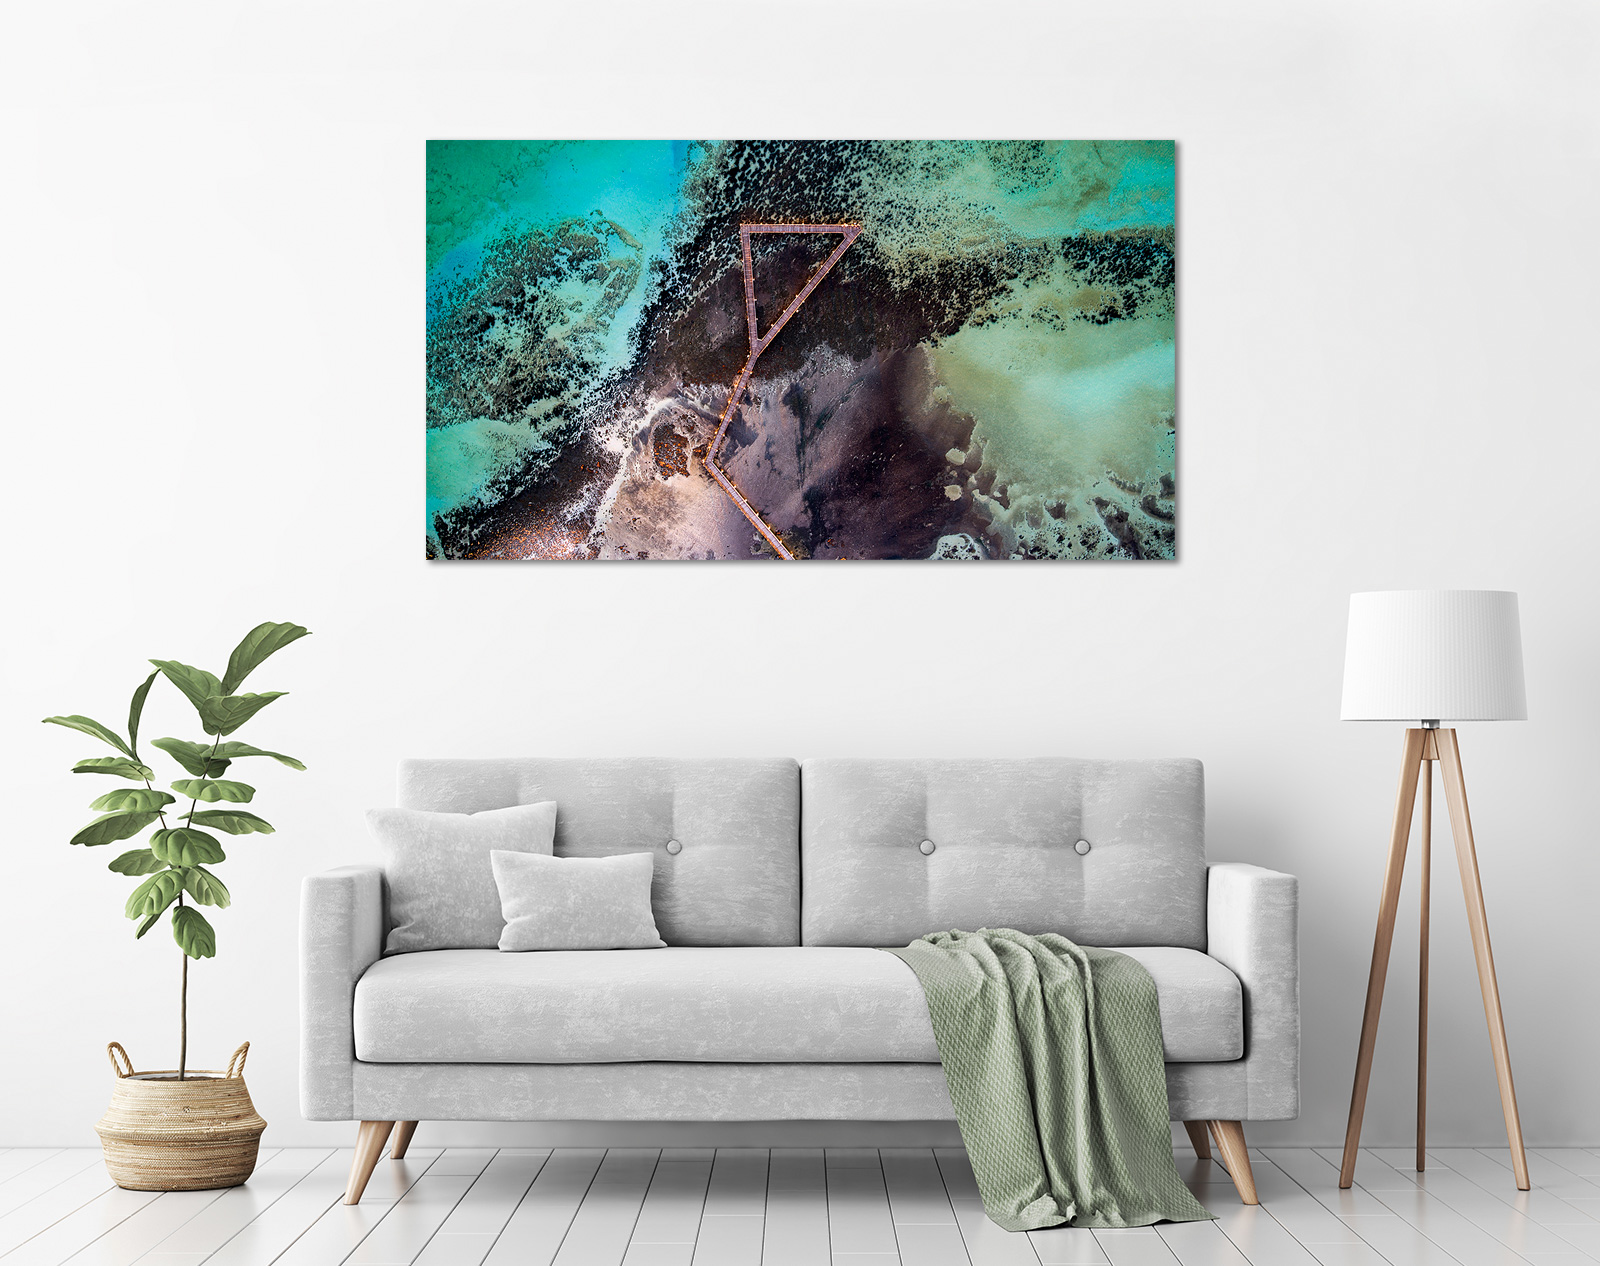 Jason Mazur - 'Stromatolites, Hamelin Pool, Shark Bay 885' in a room